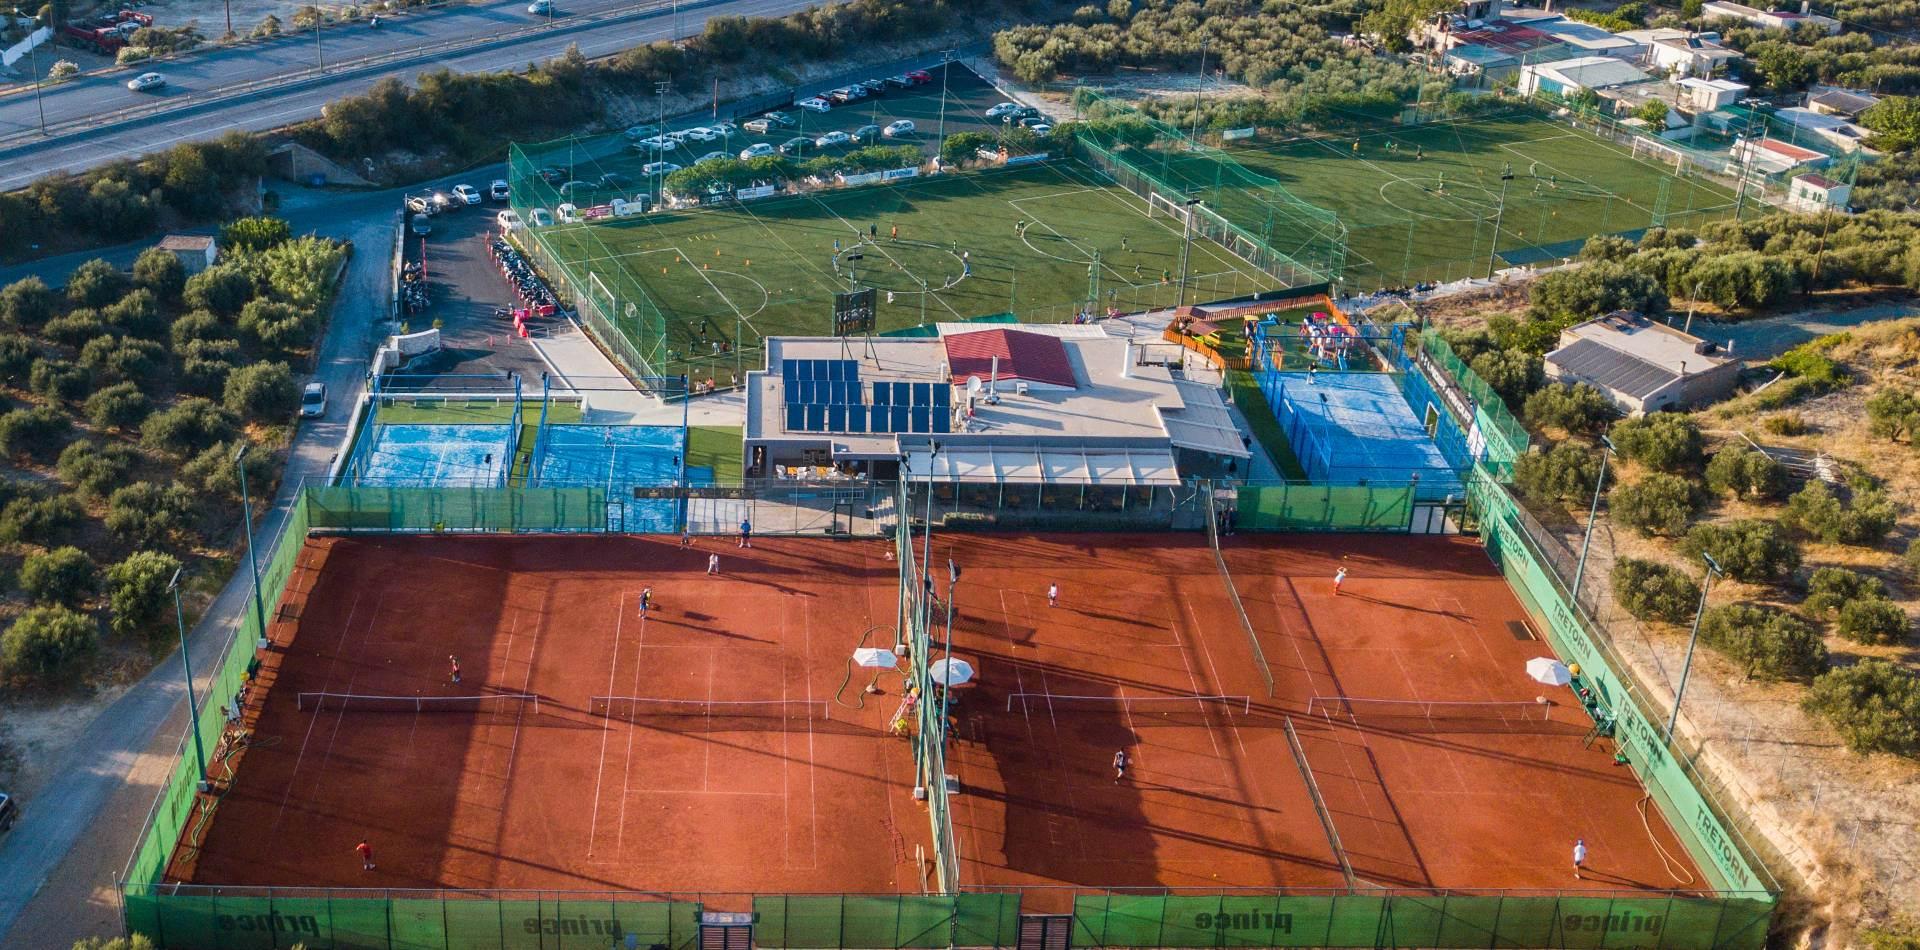 sport-point-tennis-padel-football-pa?d??a-pa?t?_02.jpg